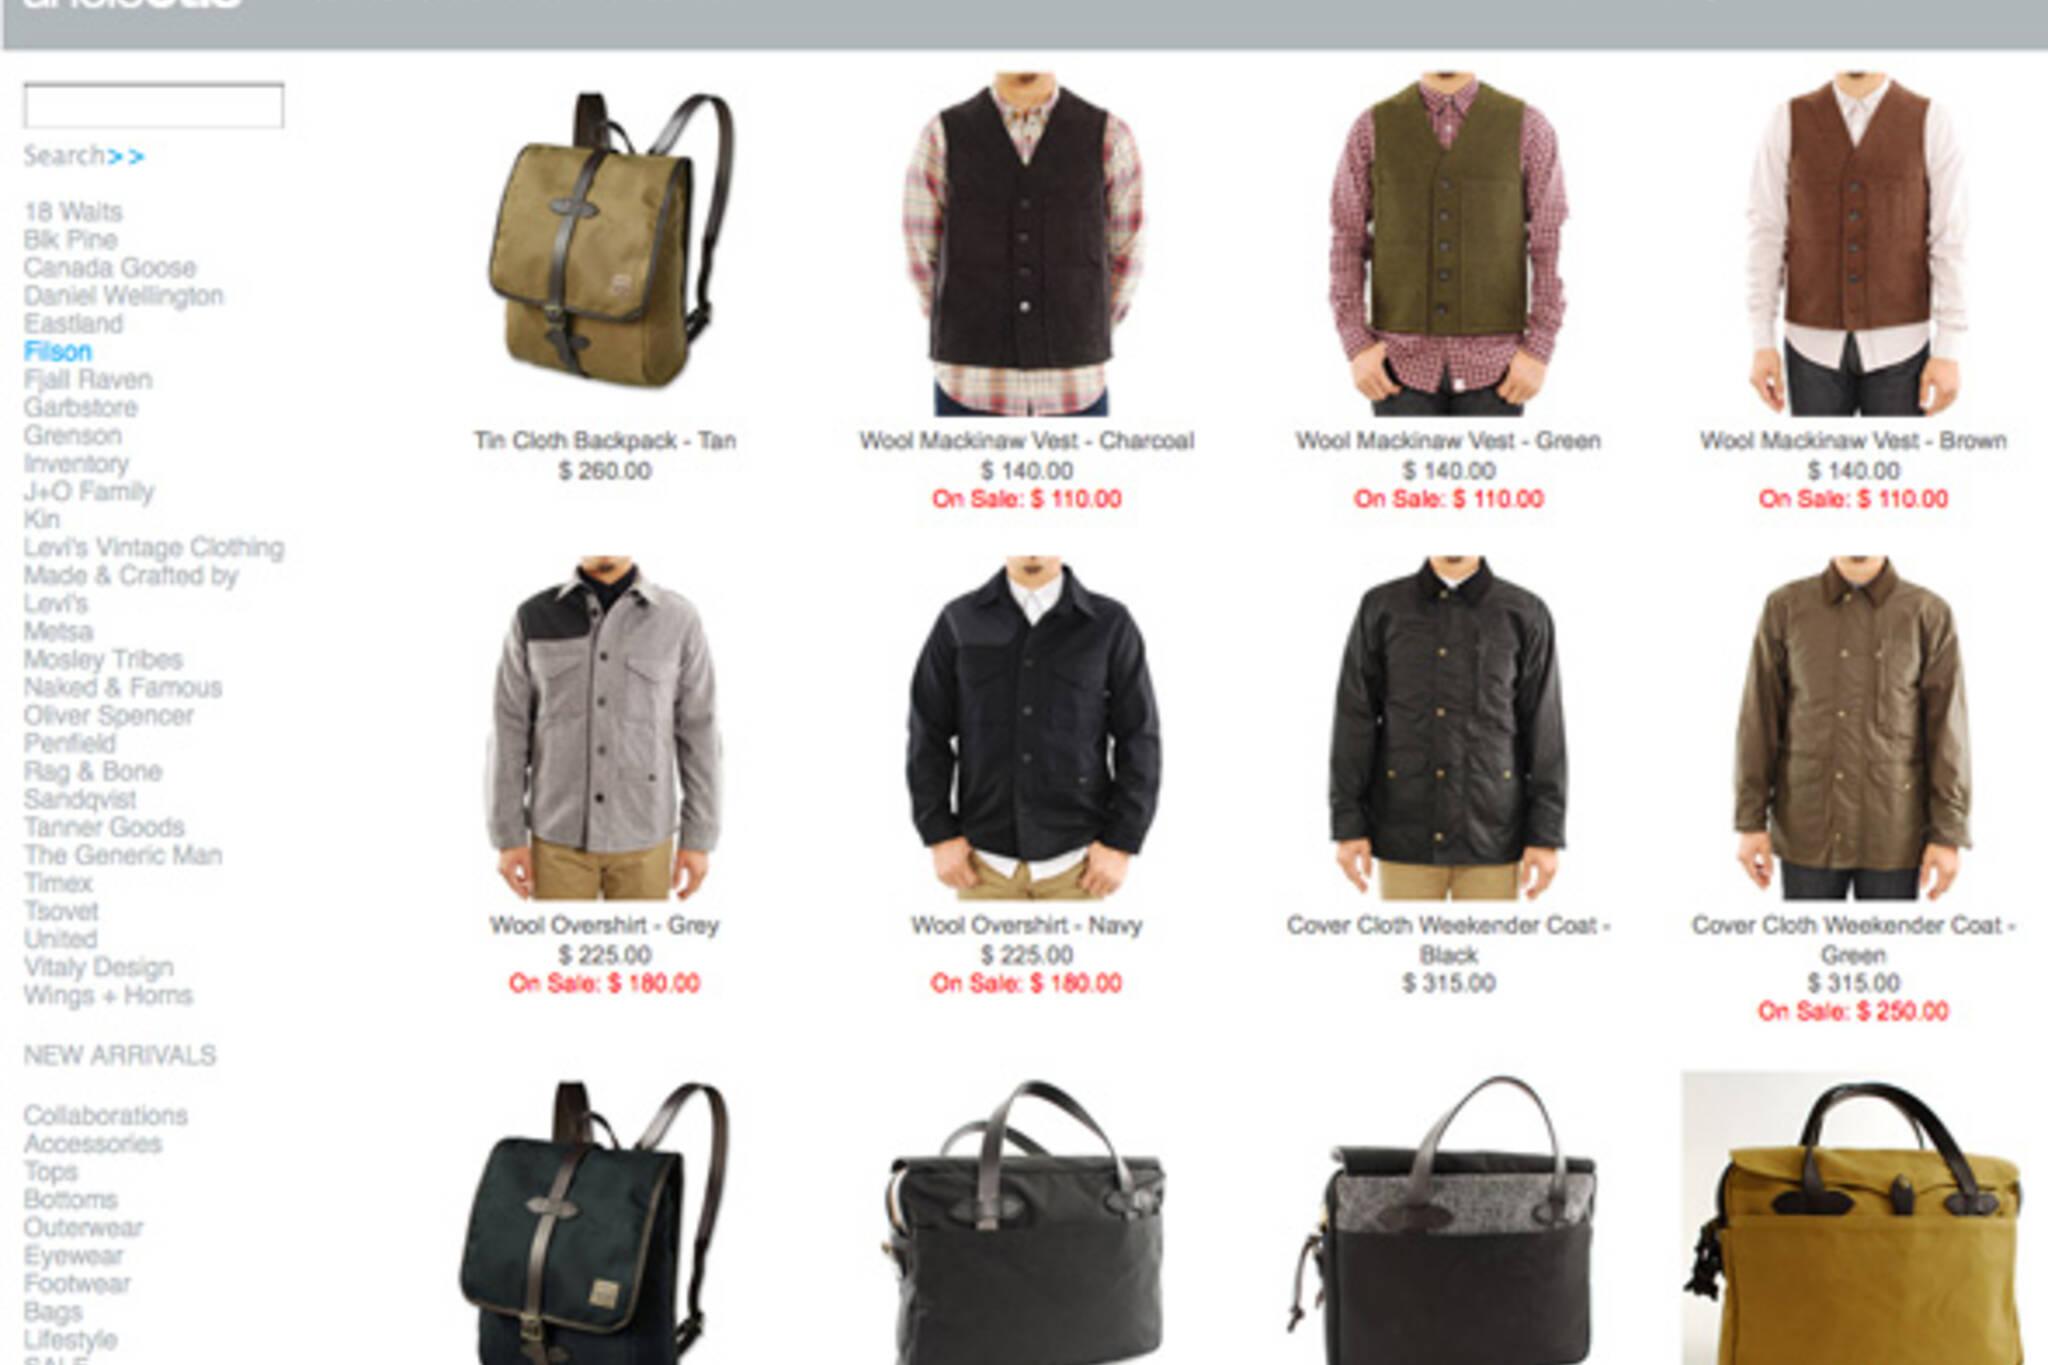 Toronto online store